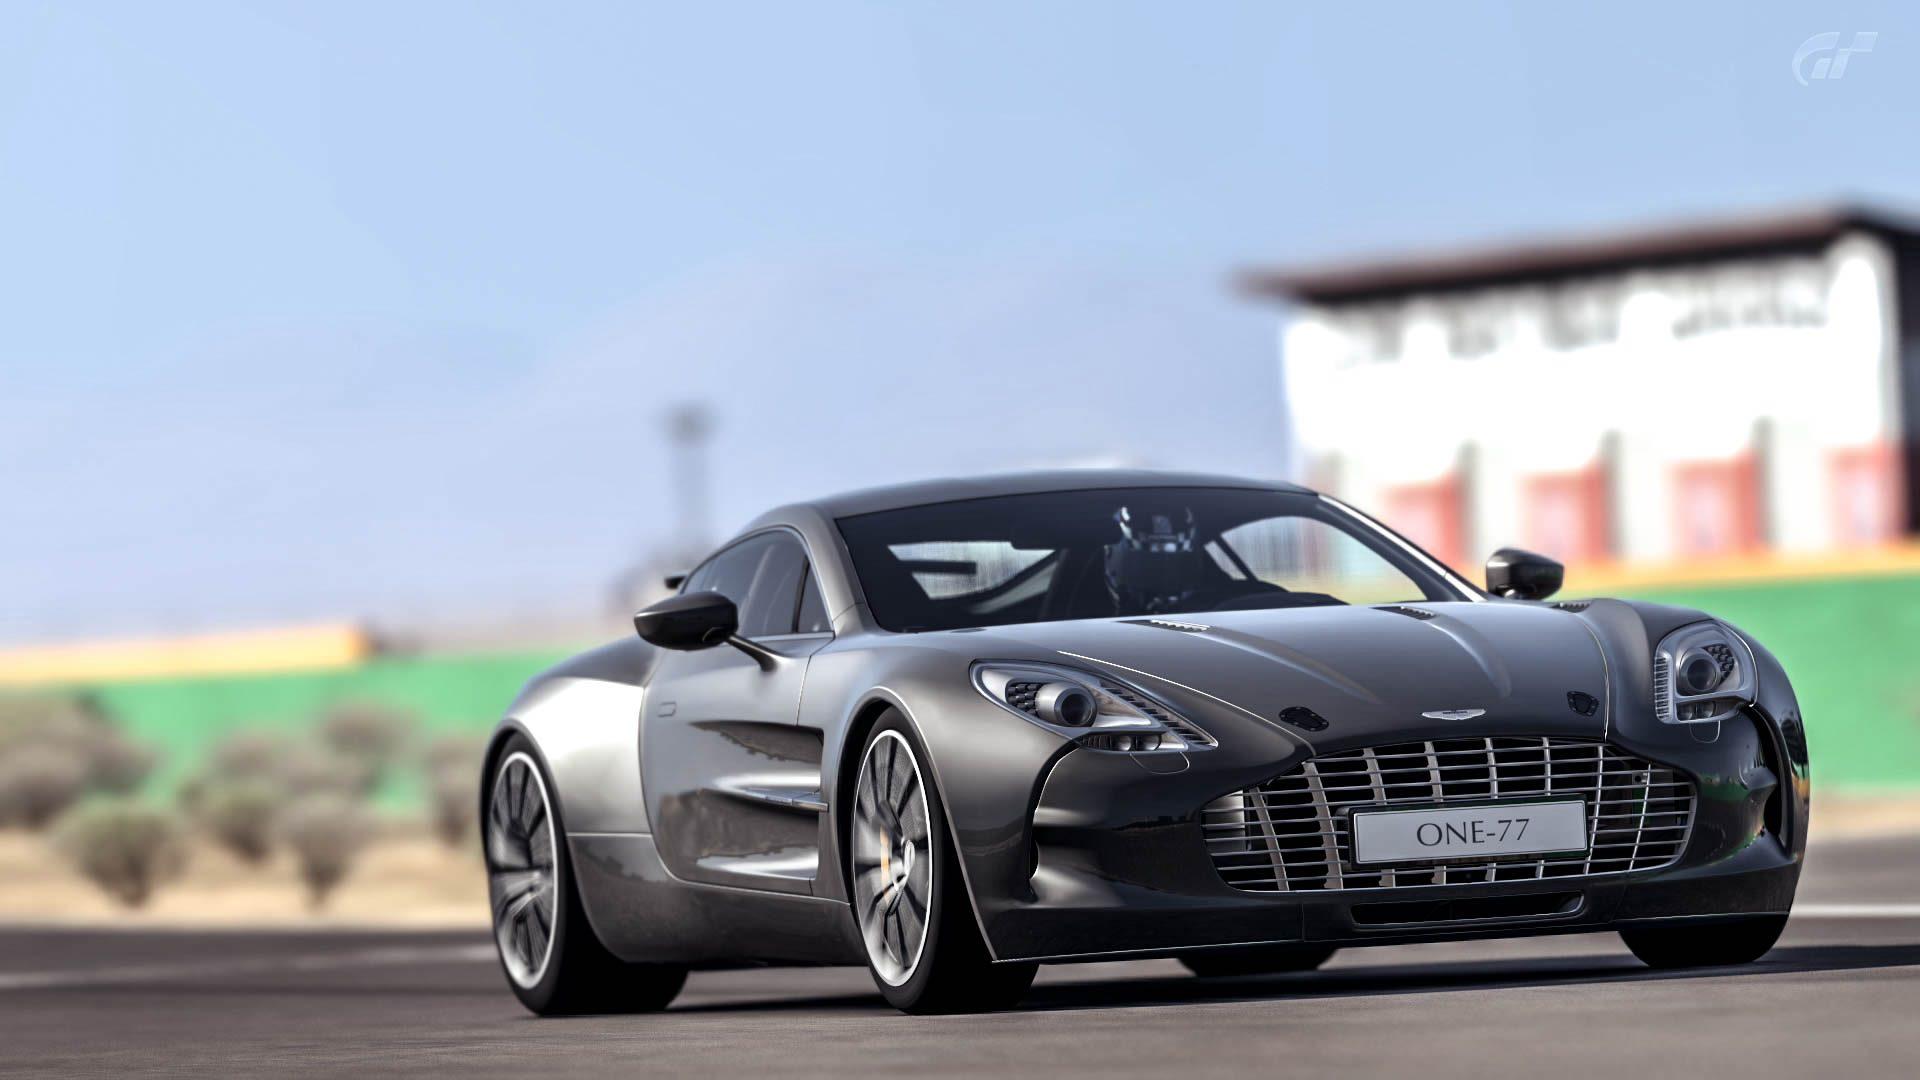 One77_Aston_9.jpg